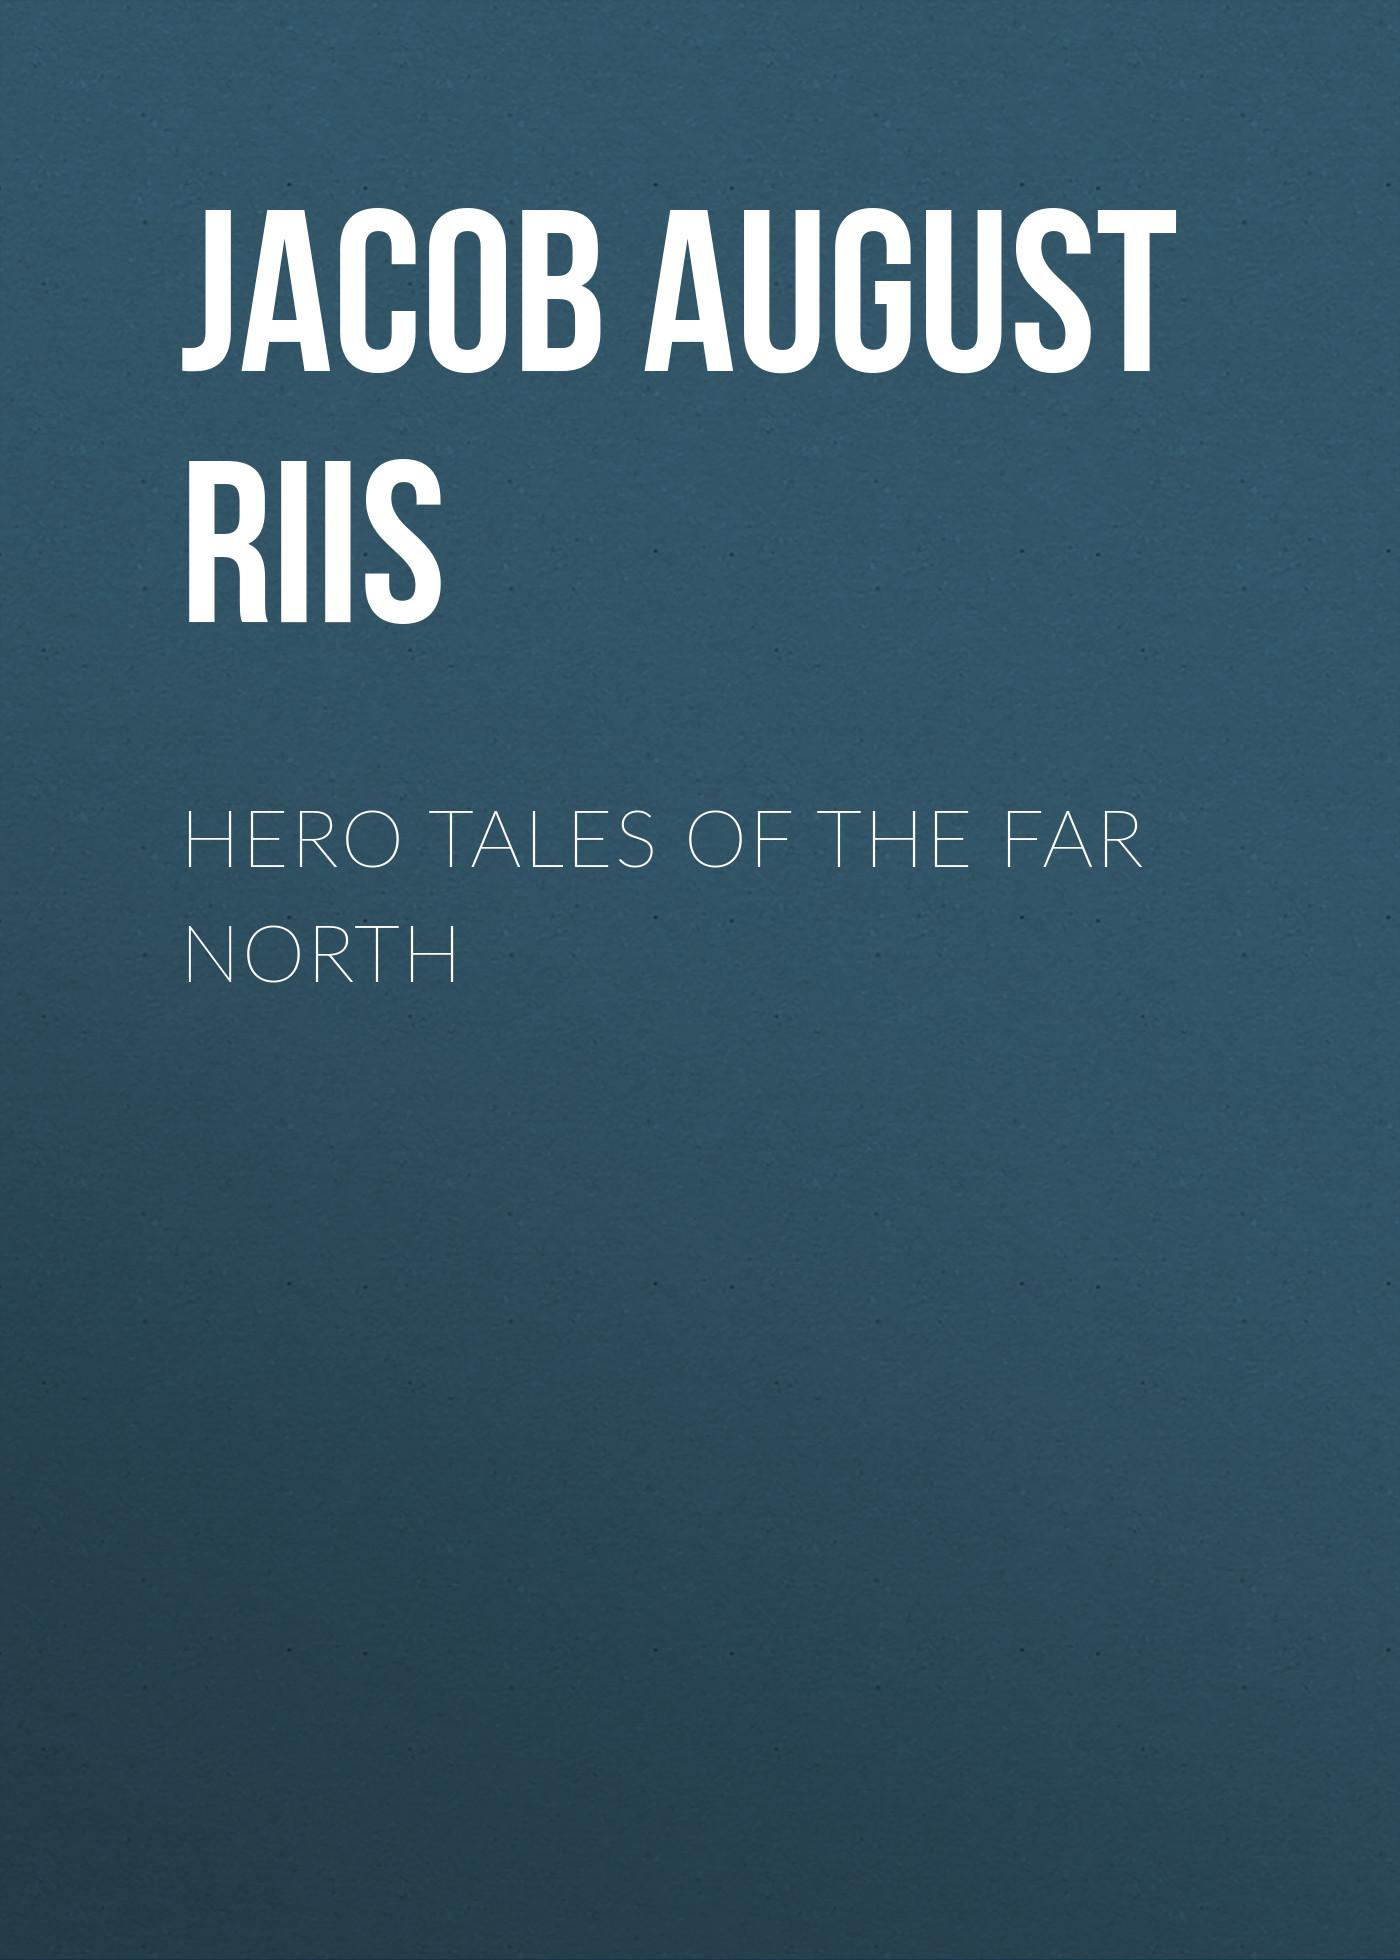 все цены на Jacob August Riis Hero Tales of the Far North